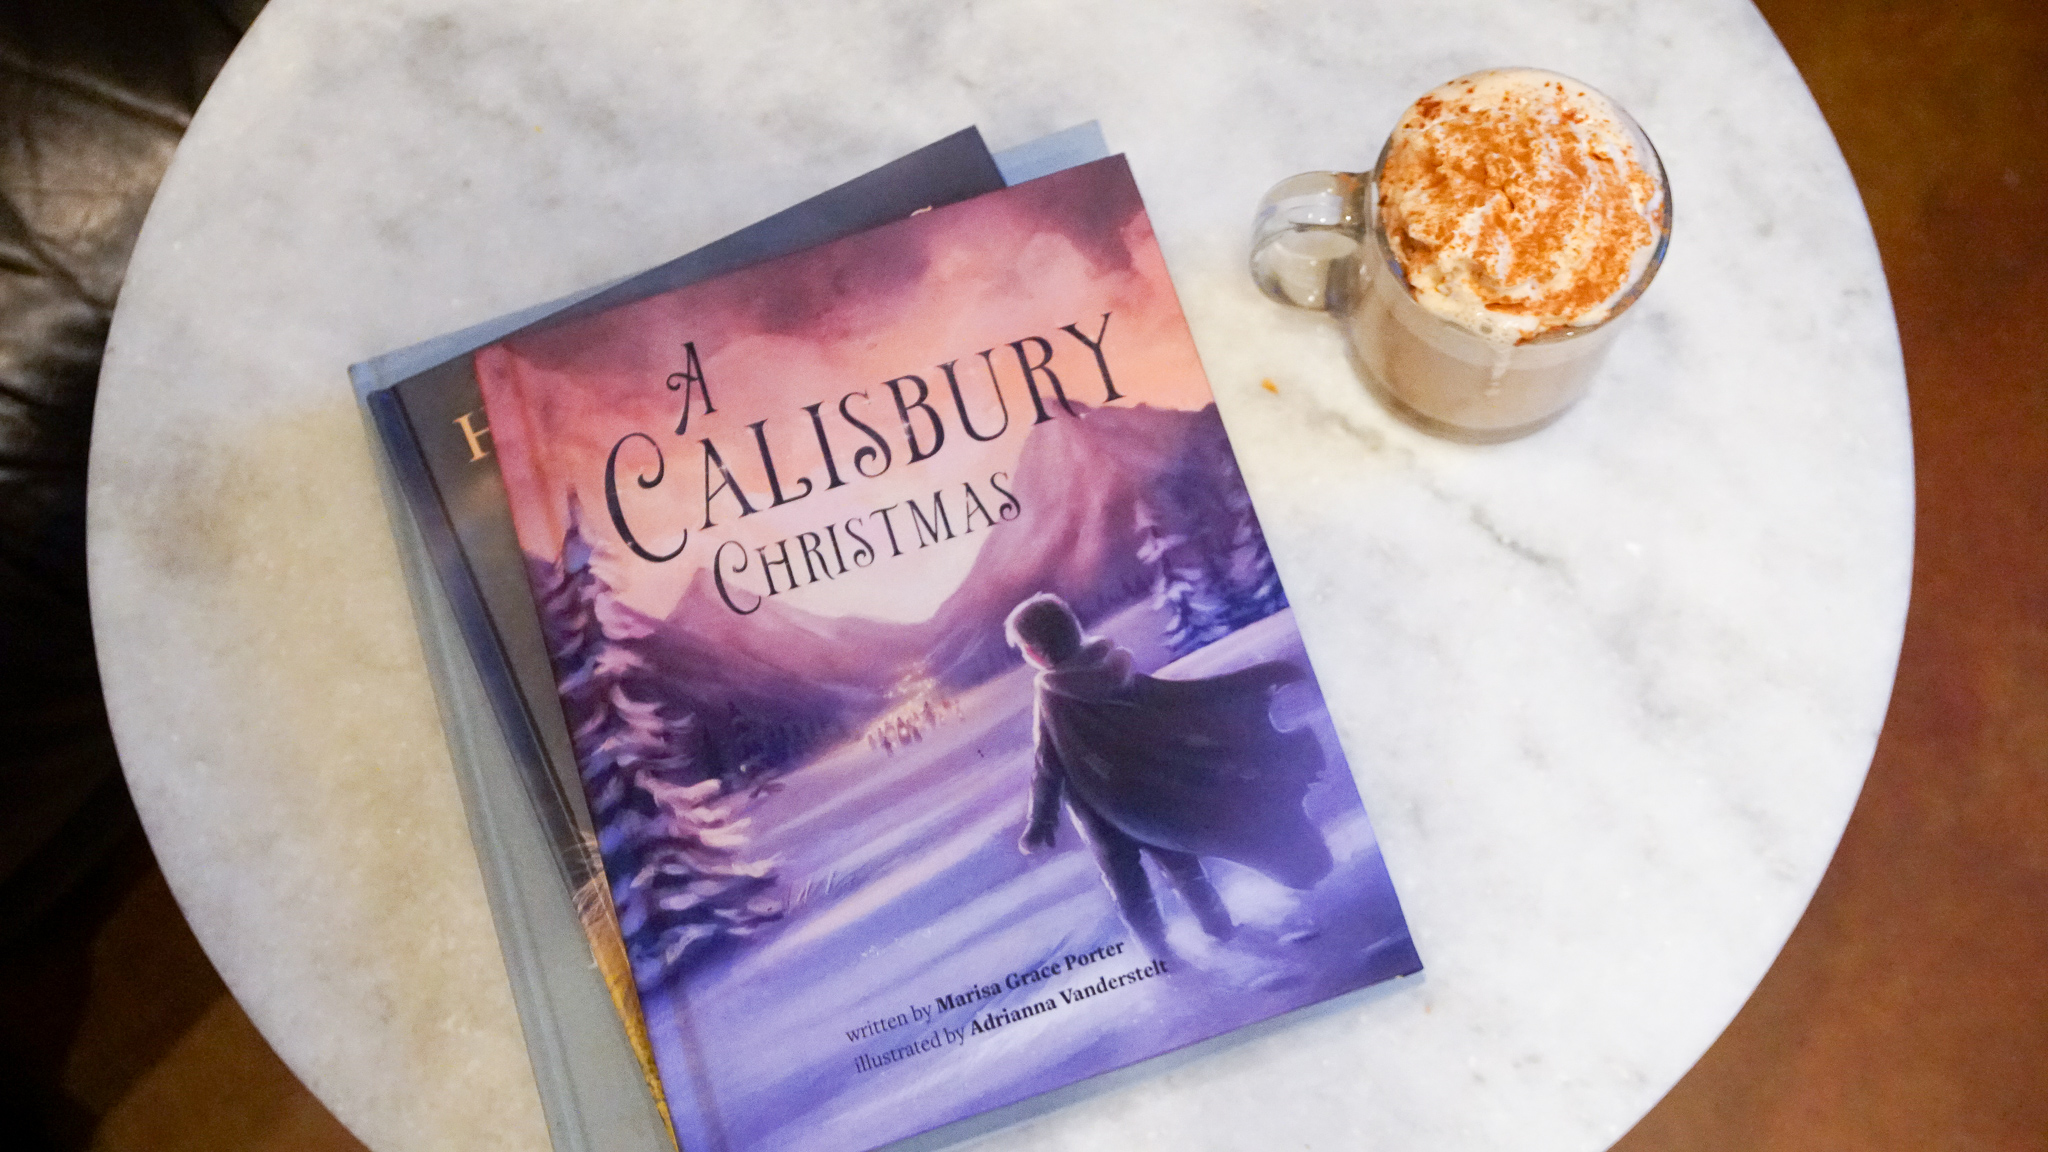 a calisbury christmas by marisa porter and adrianna vanderstelt